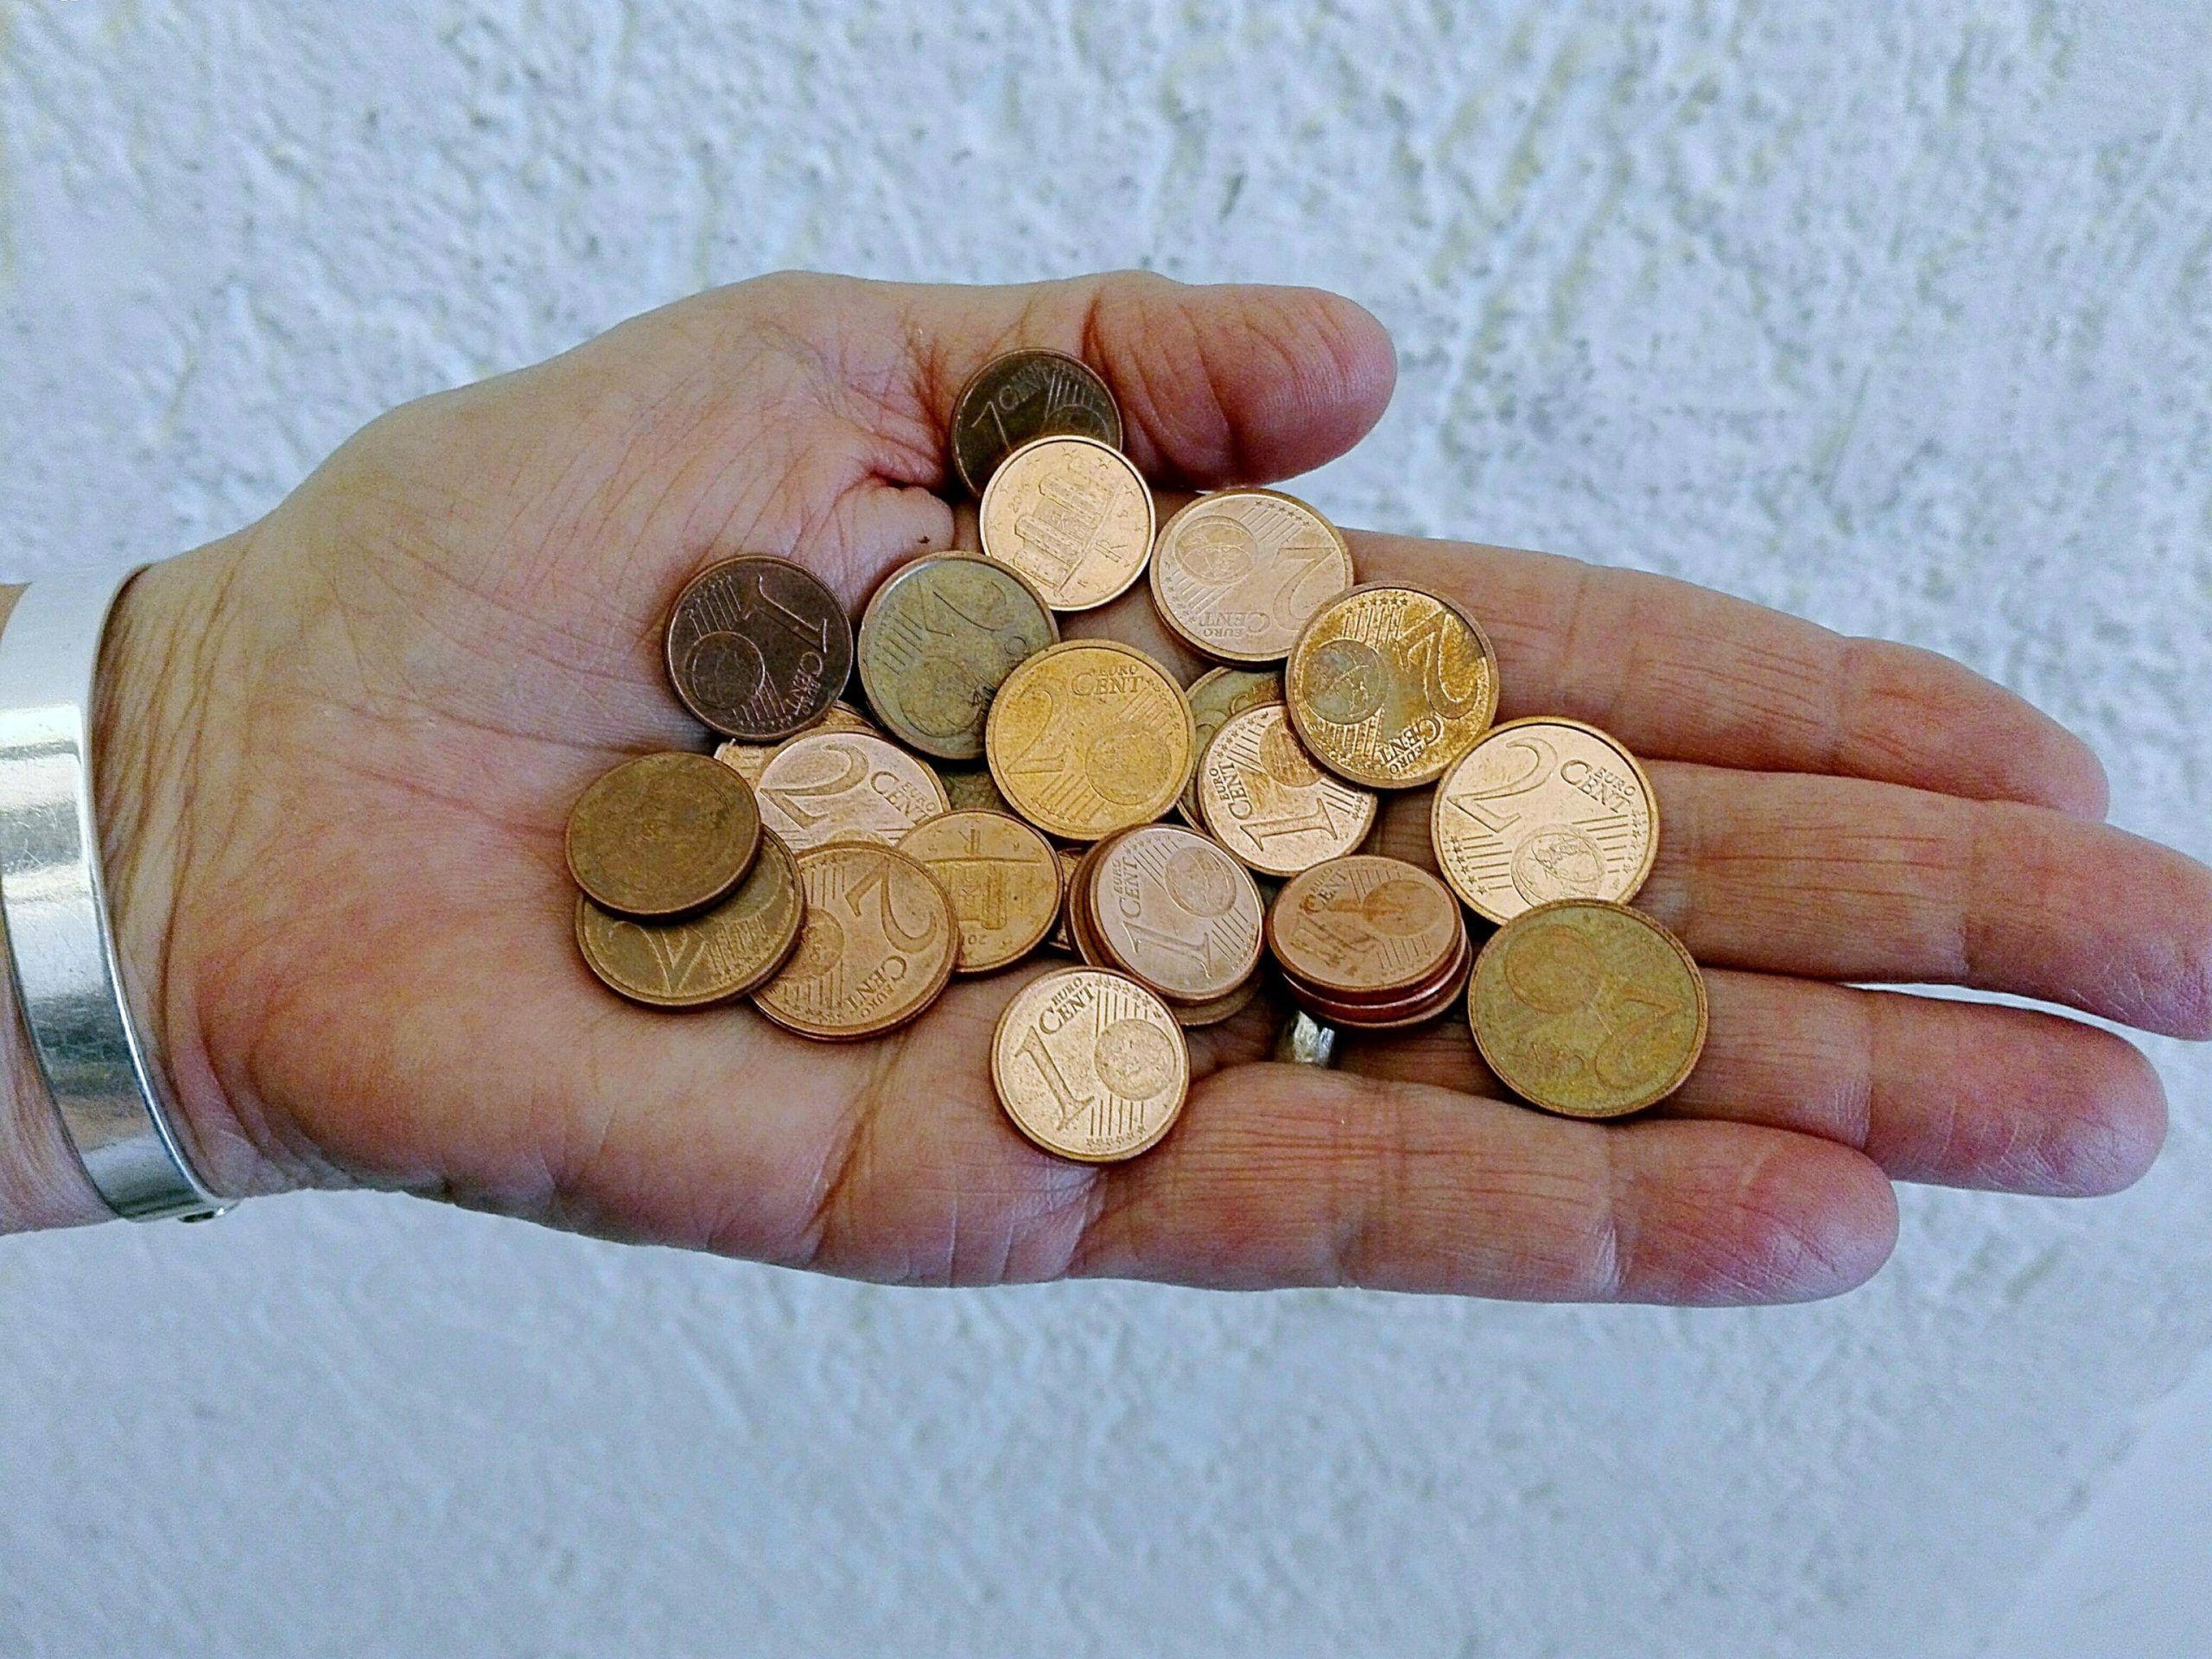 Manovra: Pd, da 2018 addio monete 1 2 centesimi